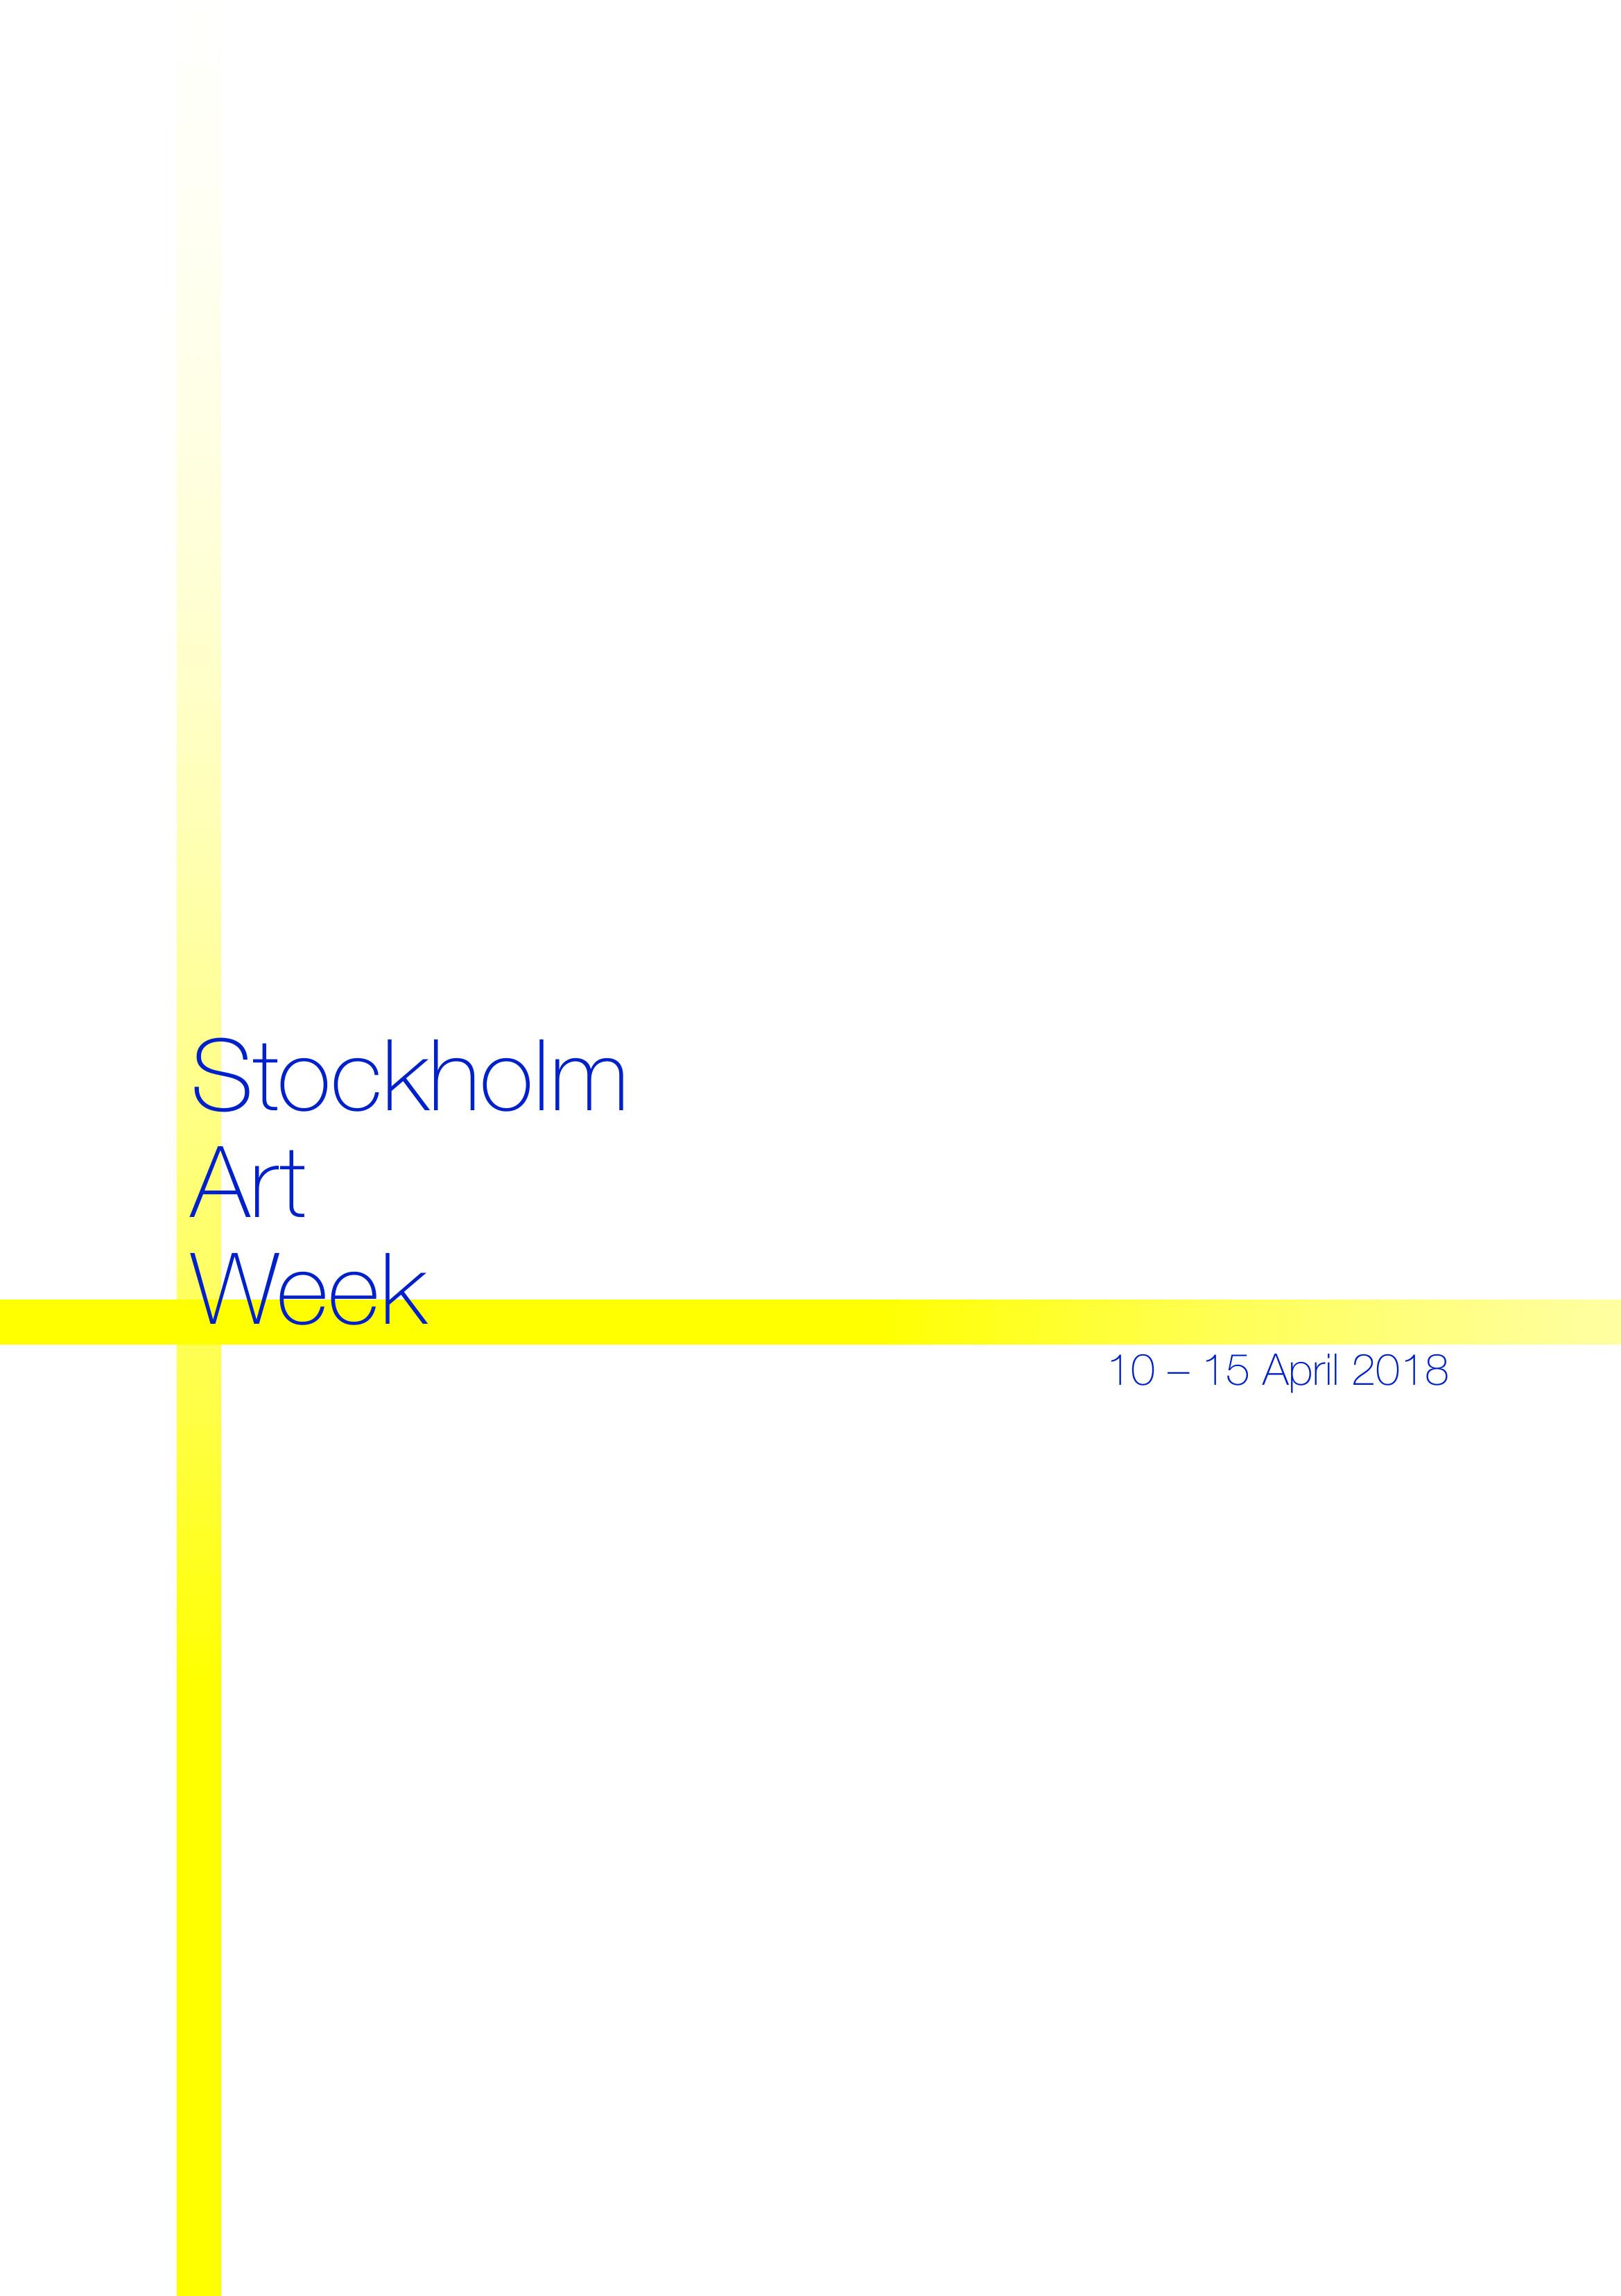 ART WEEK STOCKHOLM AWS Enter Art Foundation 2018 Artist NEW LOGO